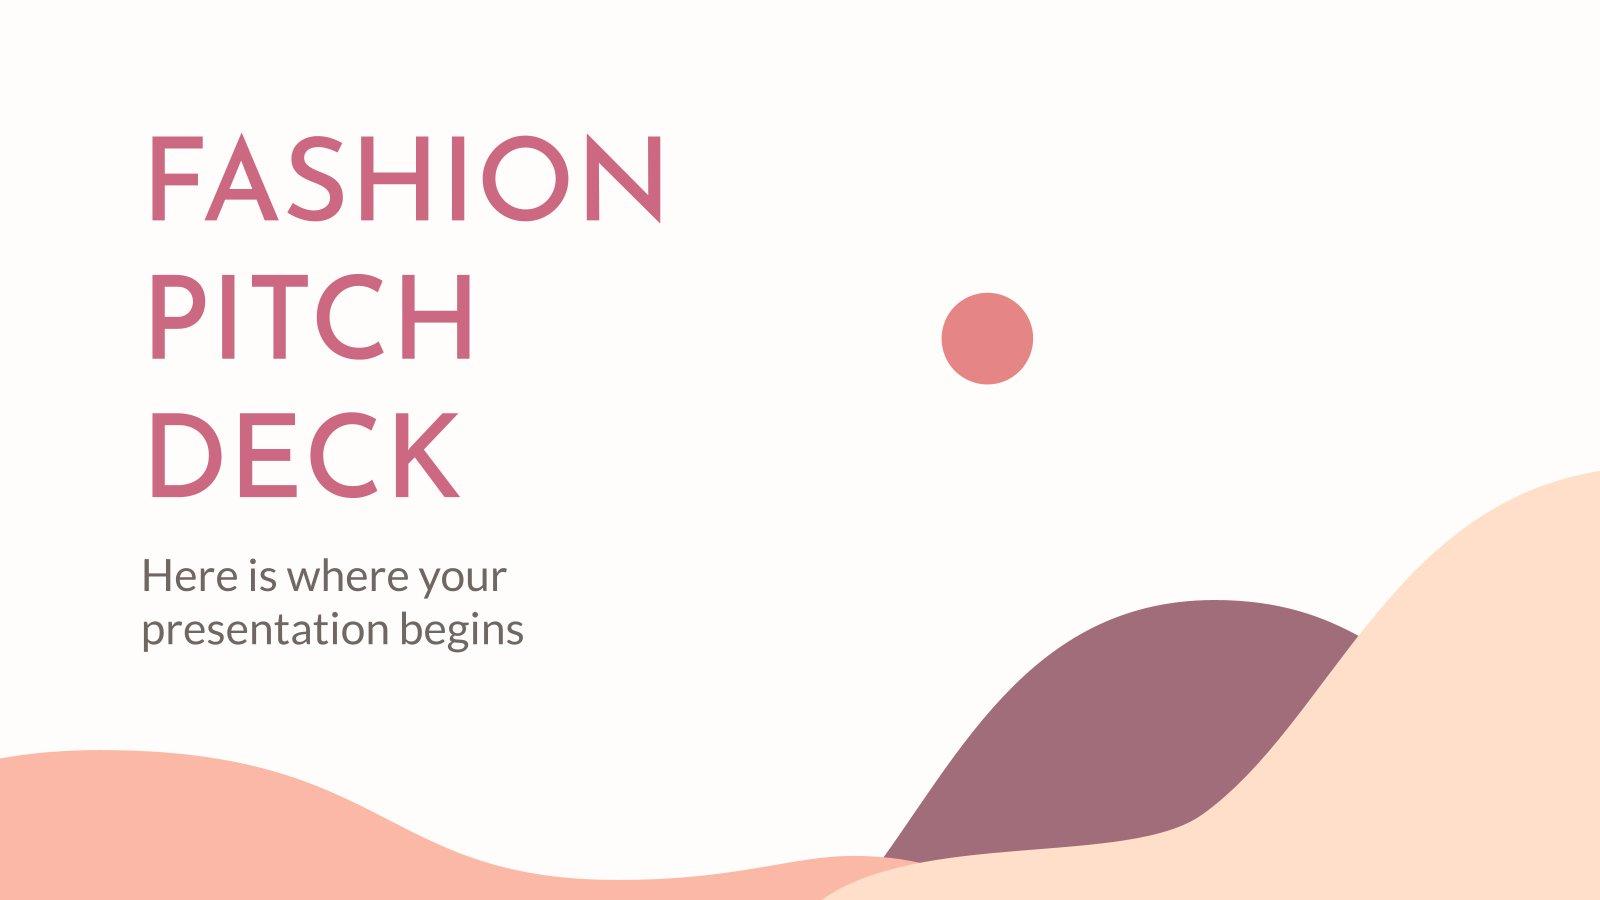 Fashion Pitch Deck presentation template